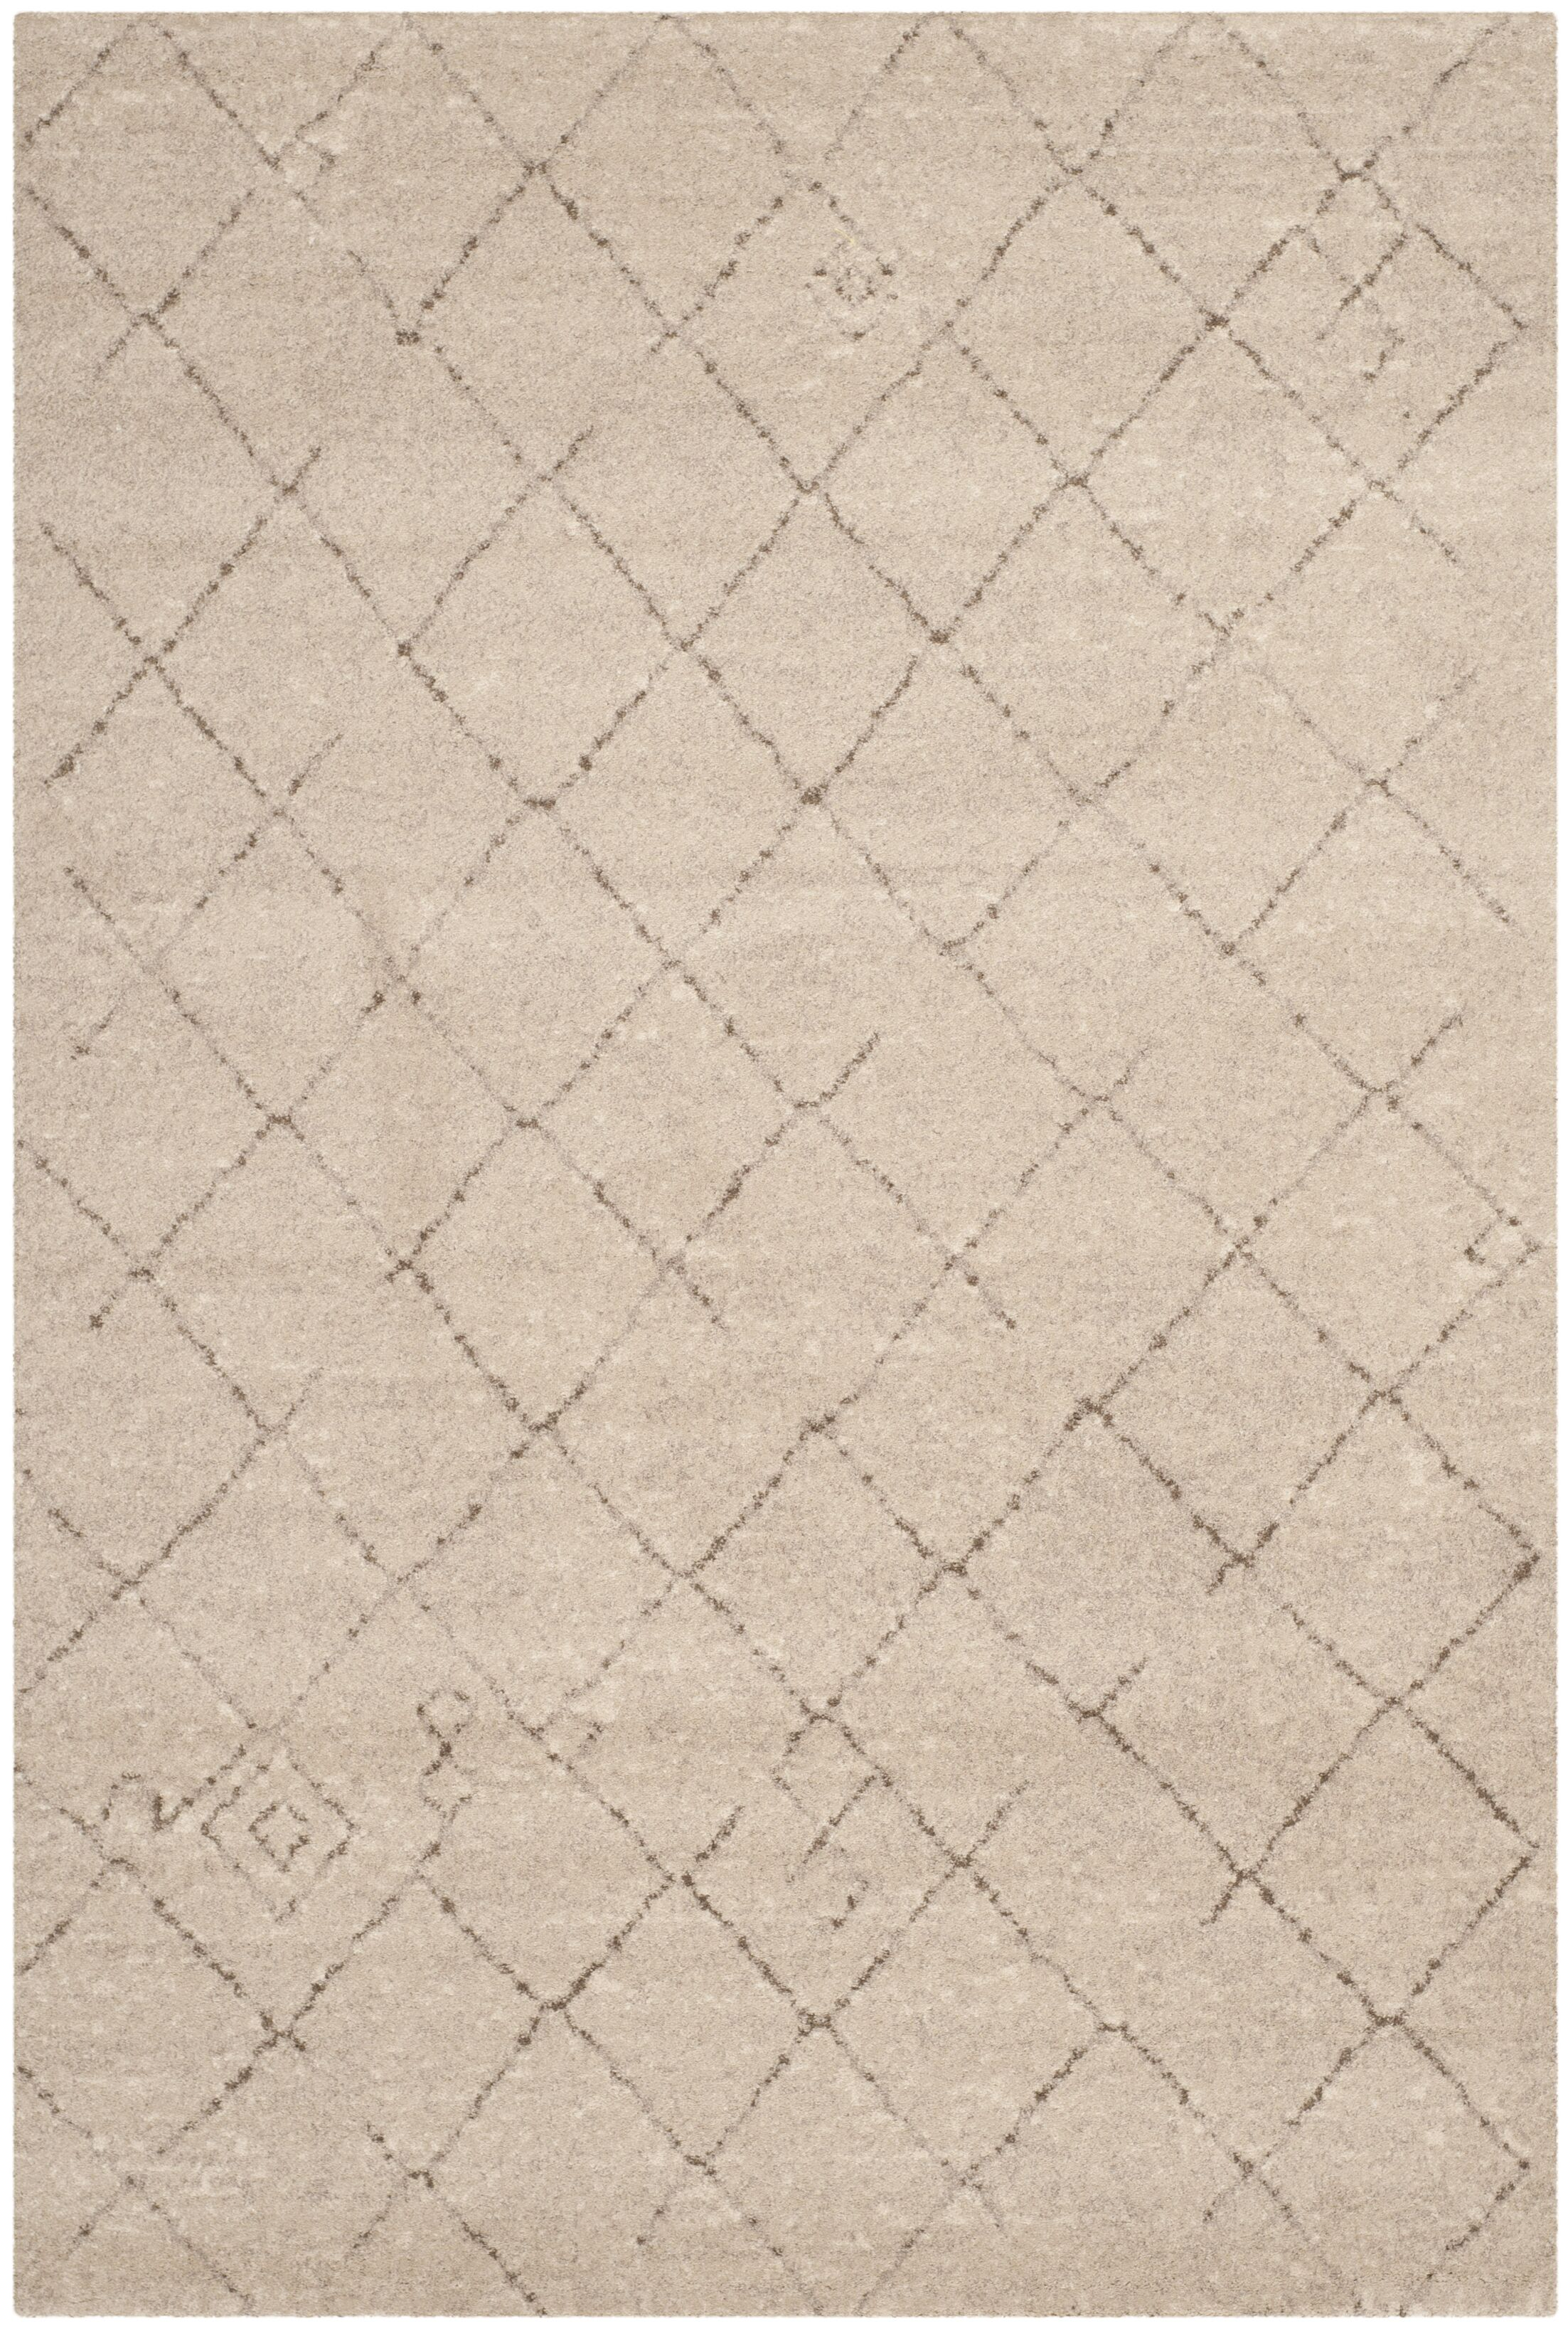 Bennett Tan Rug Rug Size: Rectangle 10' x 14'